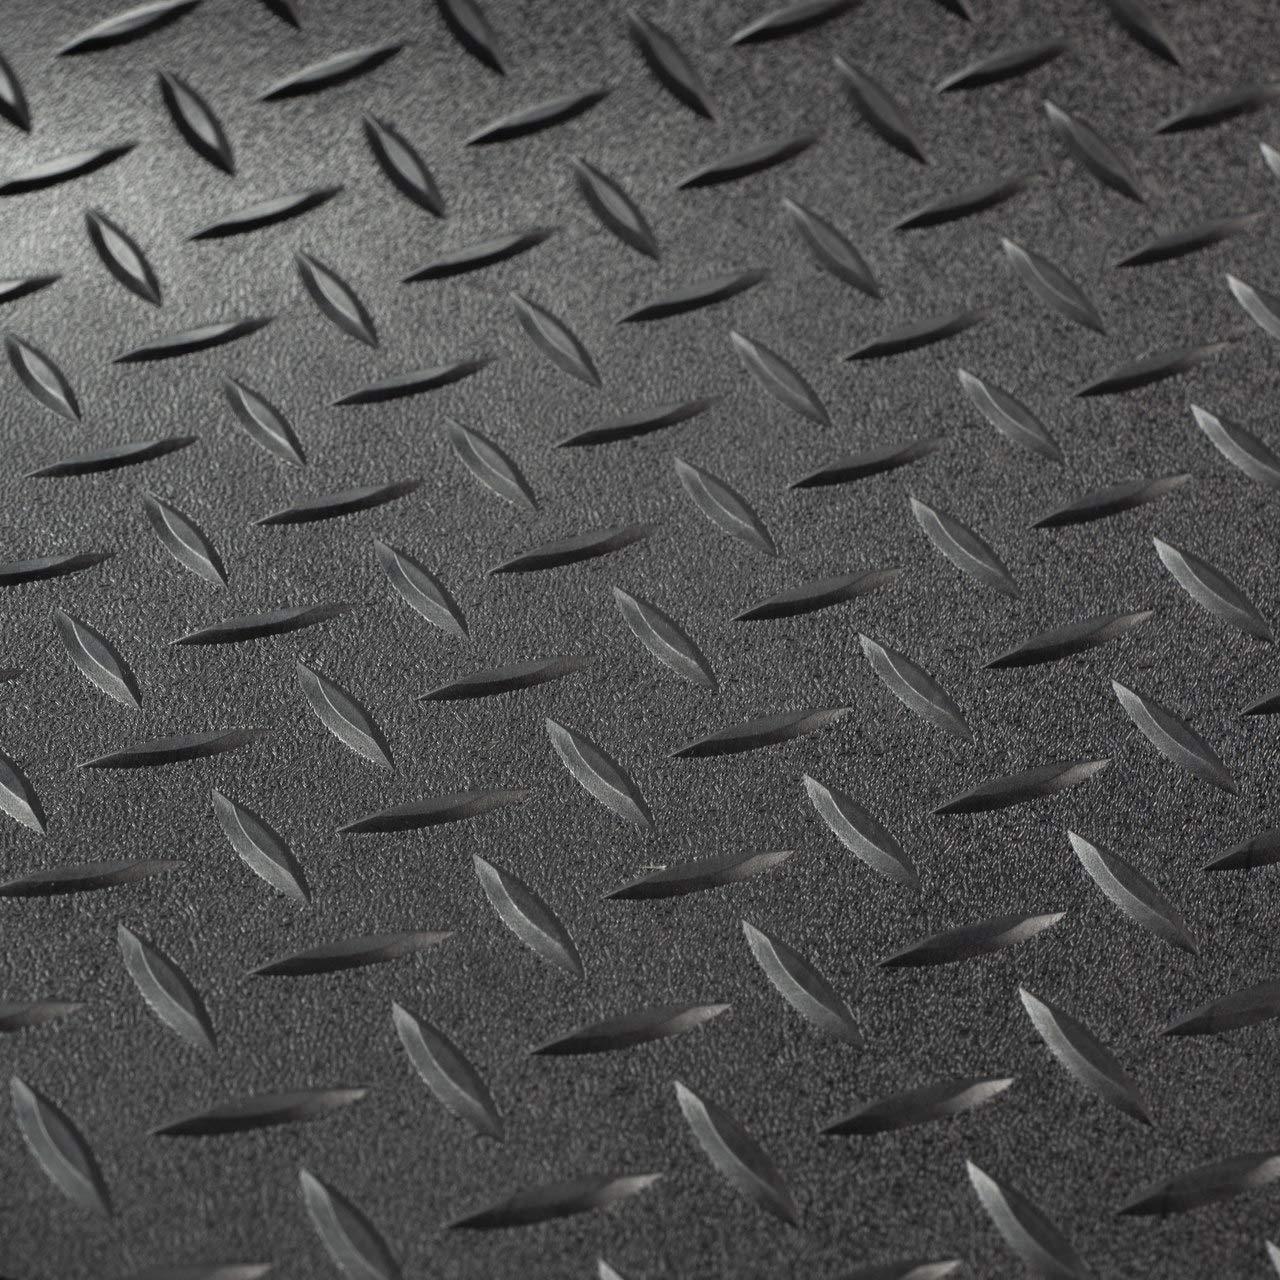 Rubber Flooring 8 2 Wide Garage Flooring Car Show Trailer Flooring Black, 15 Toy Hauler Flooring RV Trailer Diamond Plate Pattern Flooring Gym Flooring Black